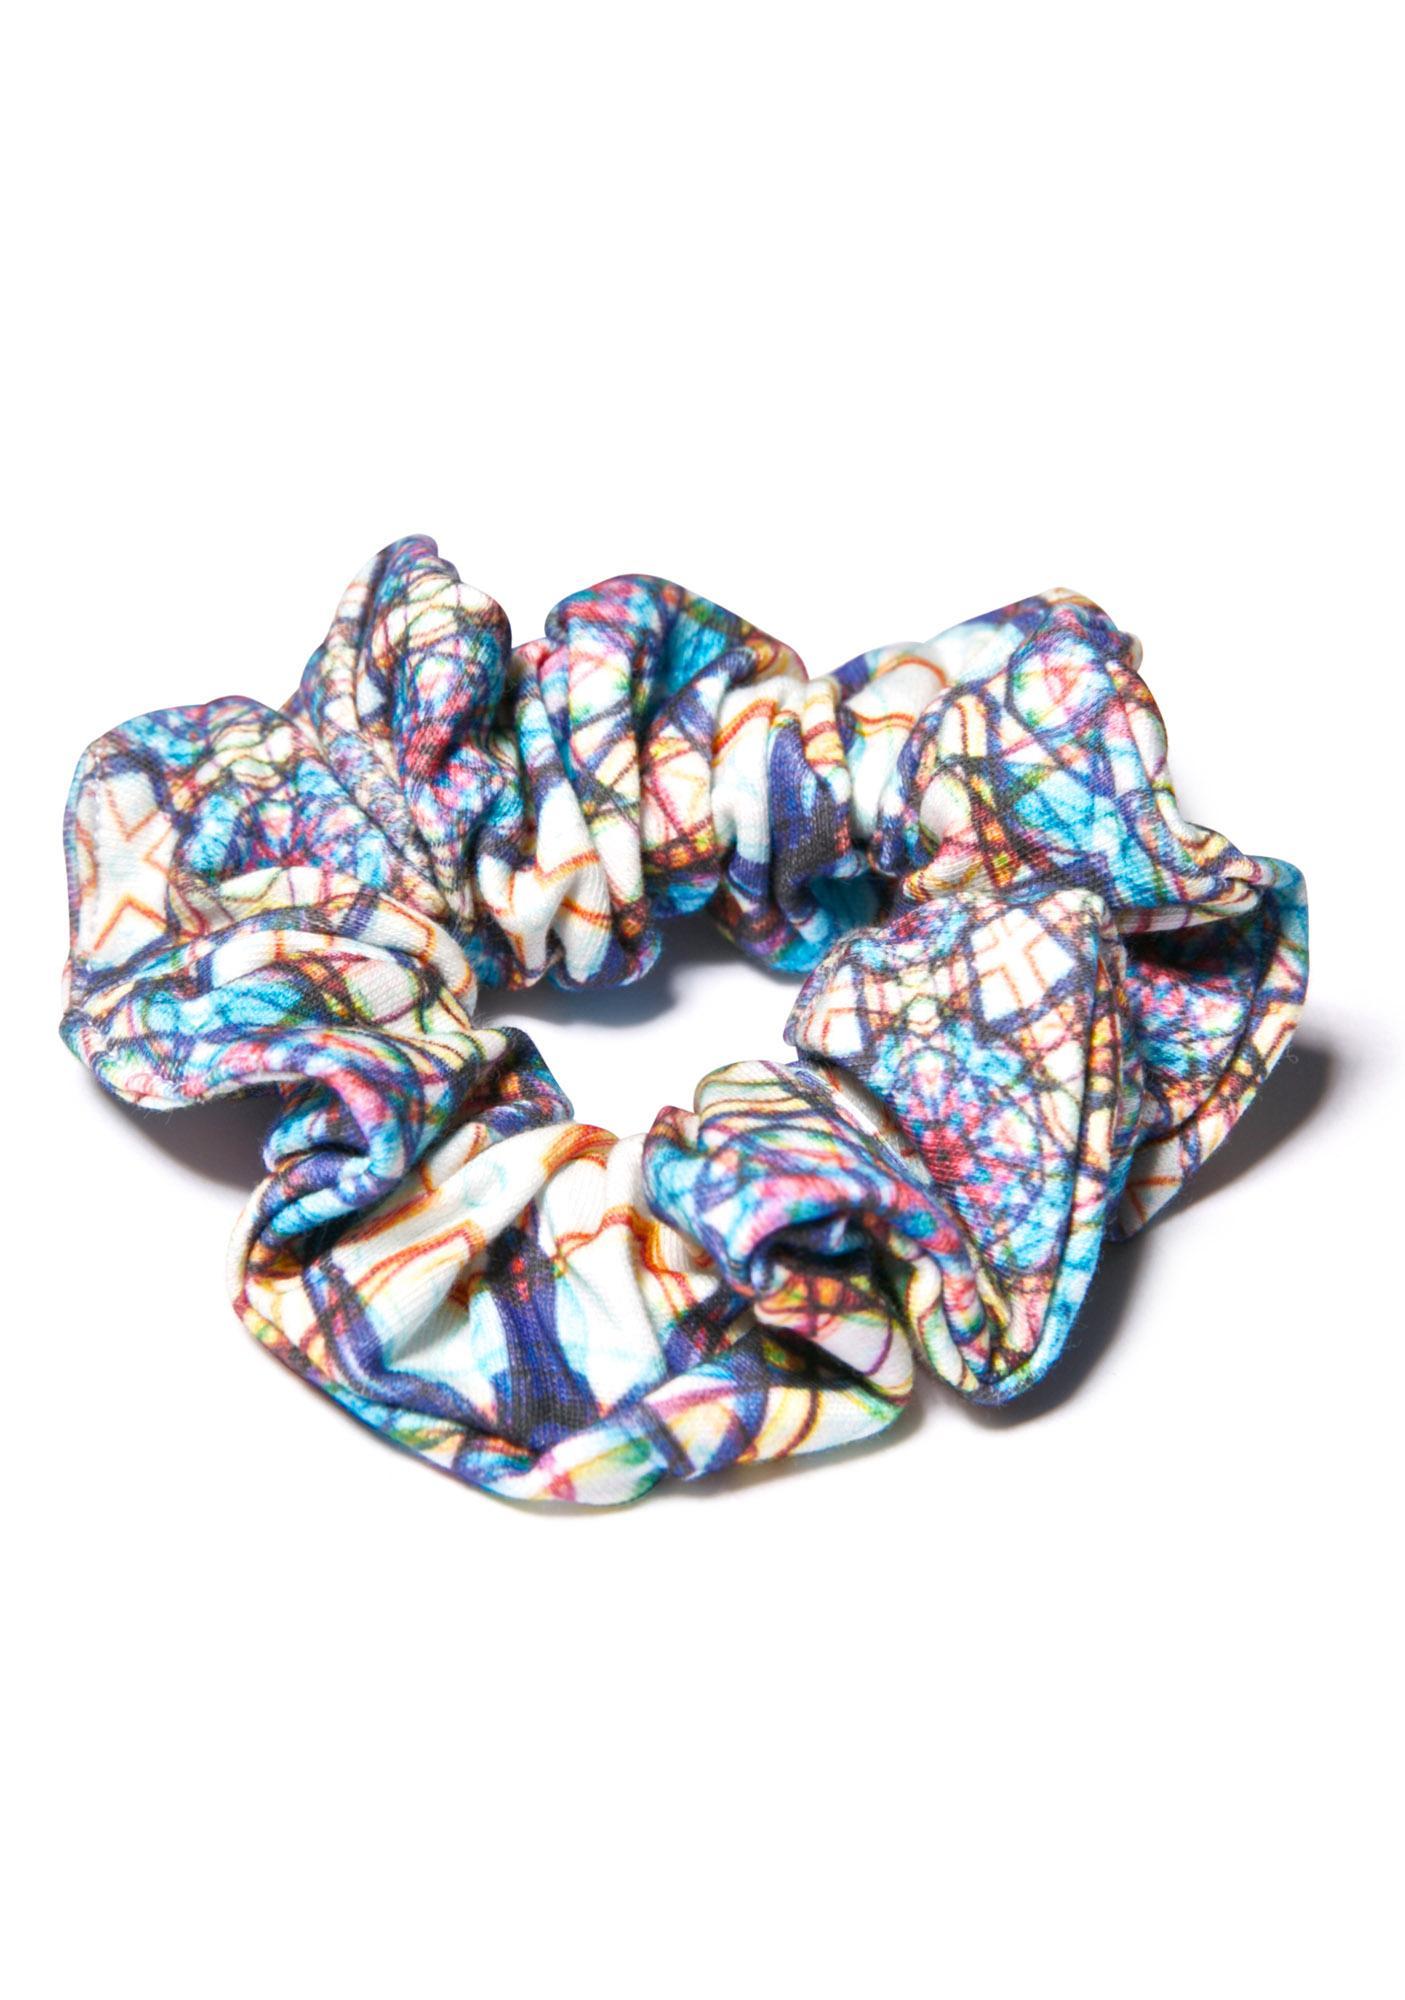 Mandala Scrunchie